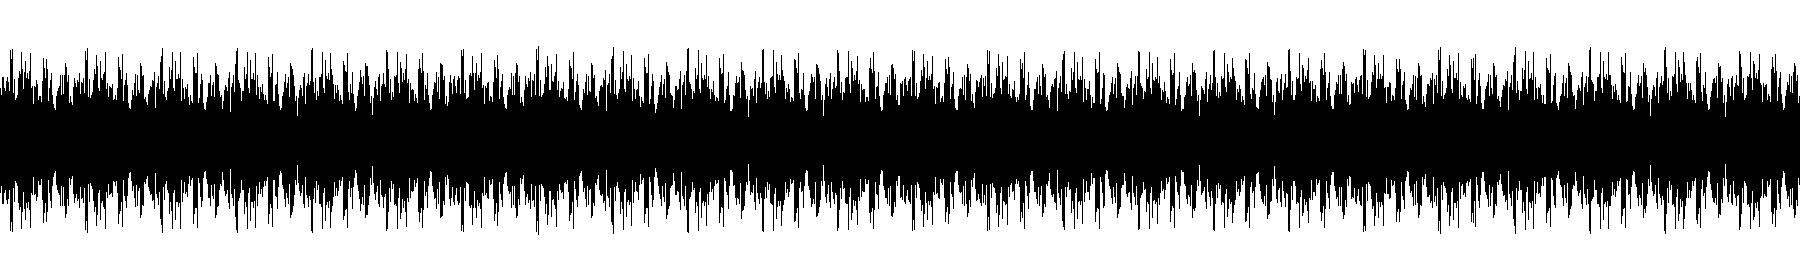 loop c texture sp01